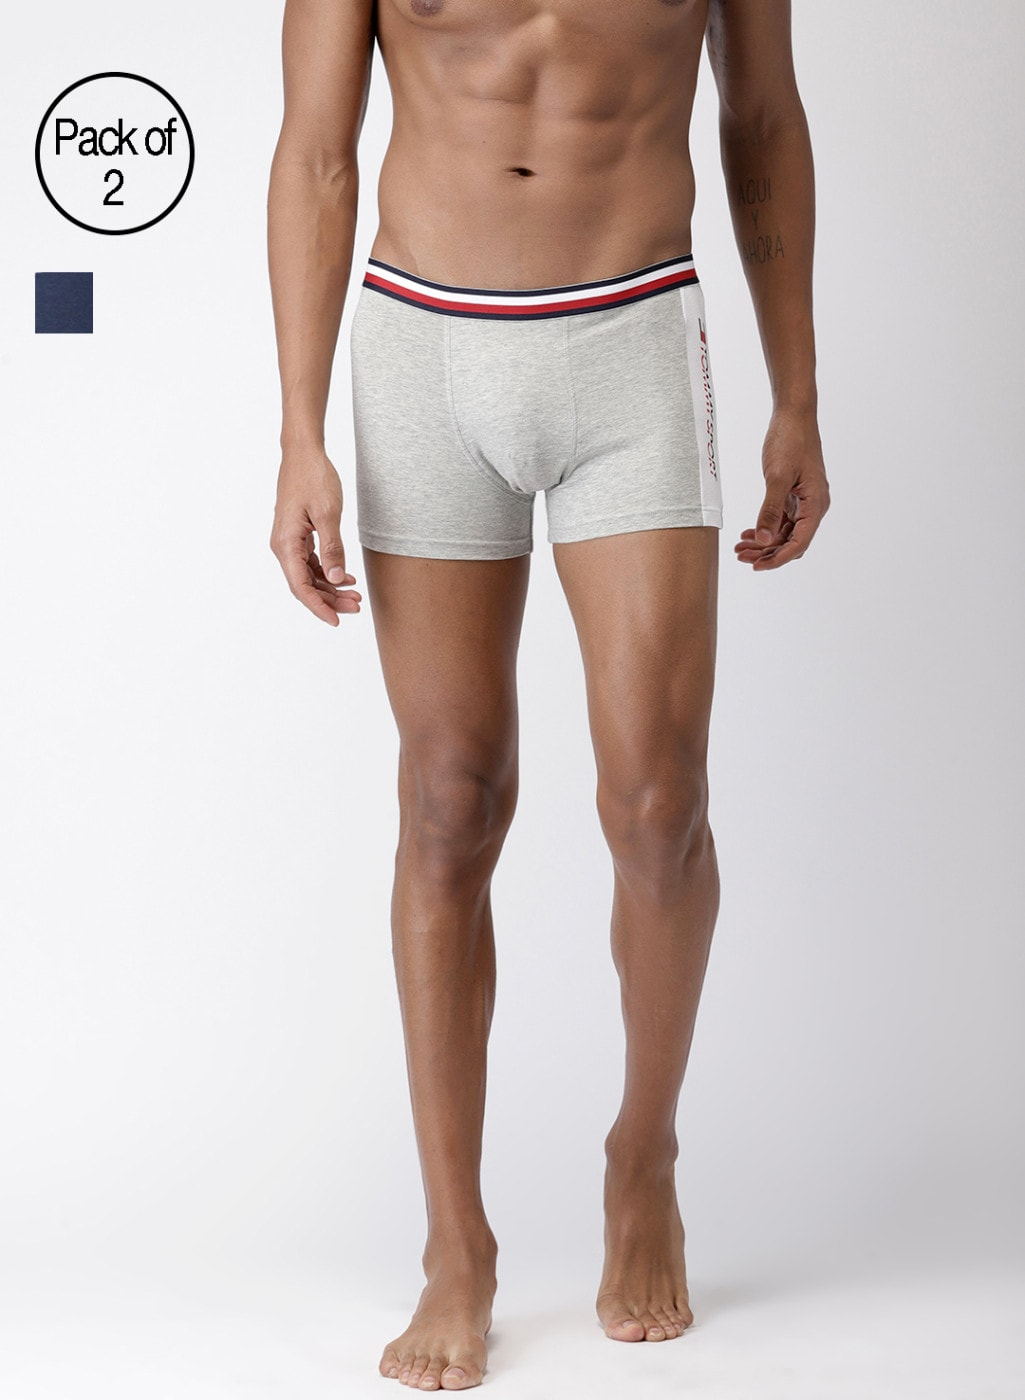 18180026bcacf2 Grey Men Innerwear Jockey Tommy Hilfiger - Buy Grey Men Innerwear Jockey  Tommy Hilfiger online in India - Jabong